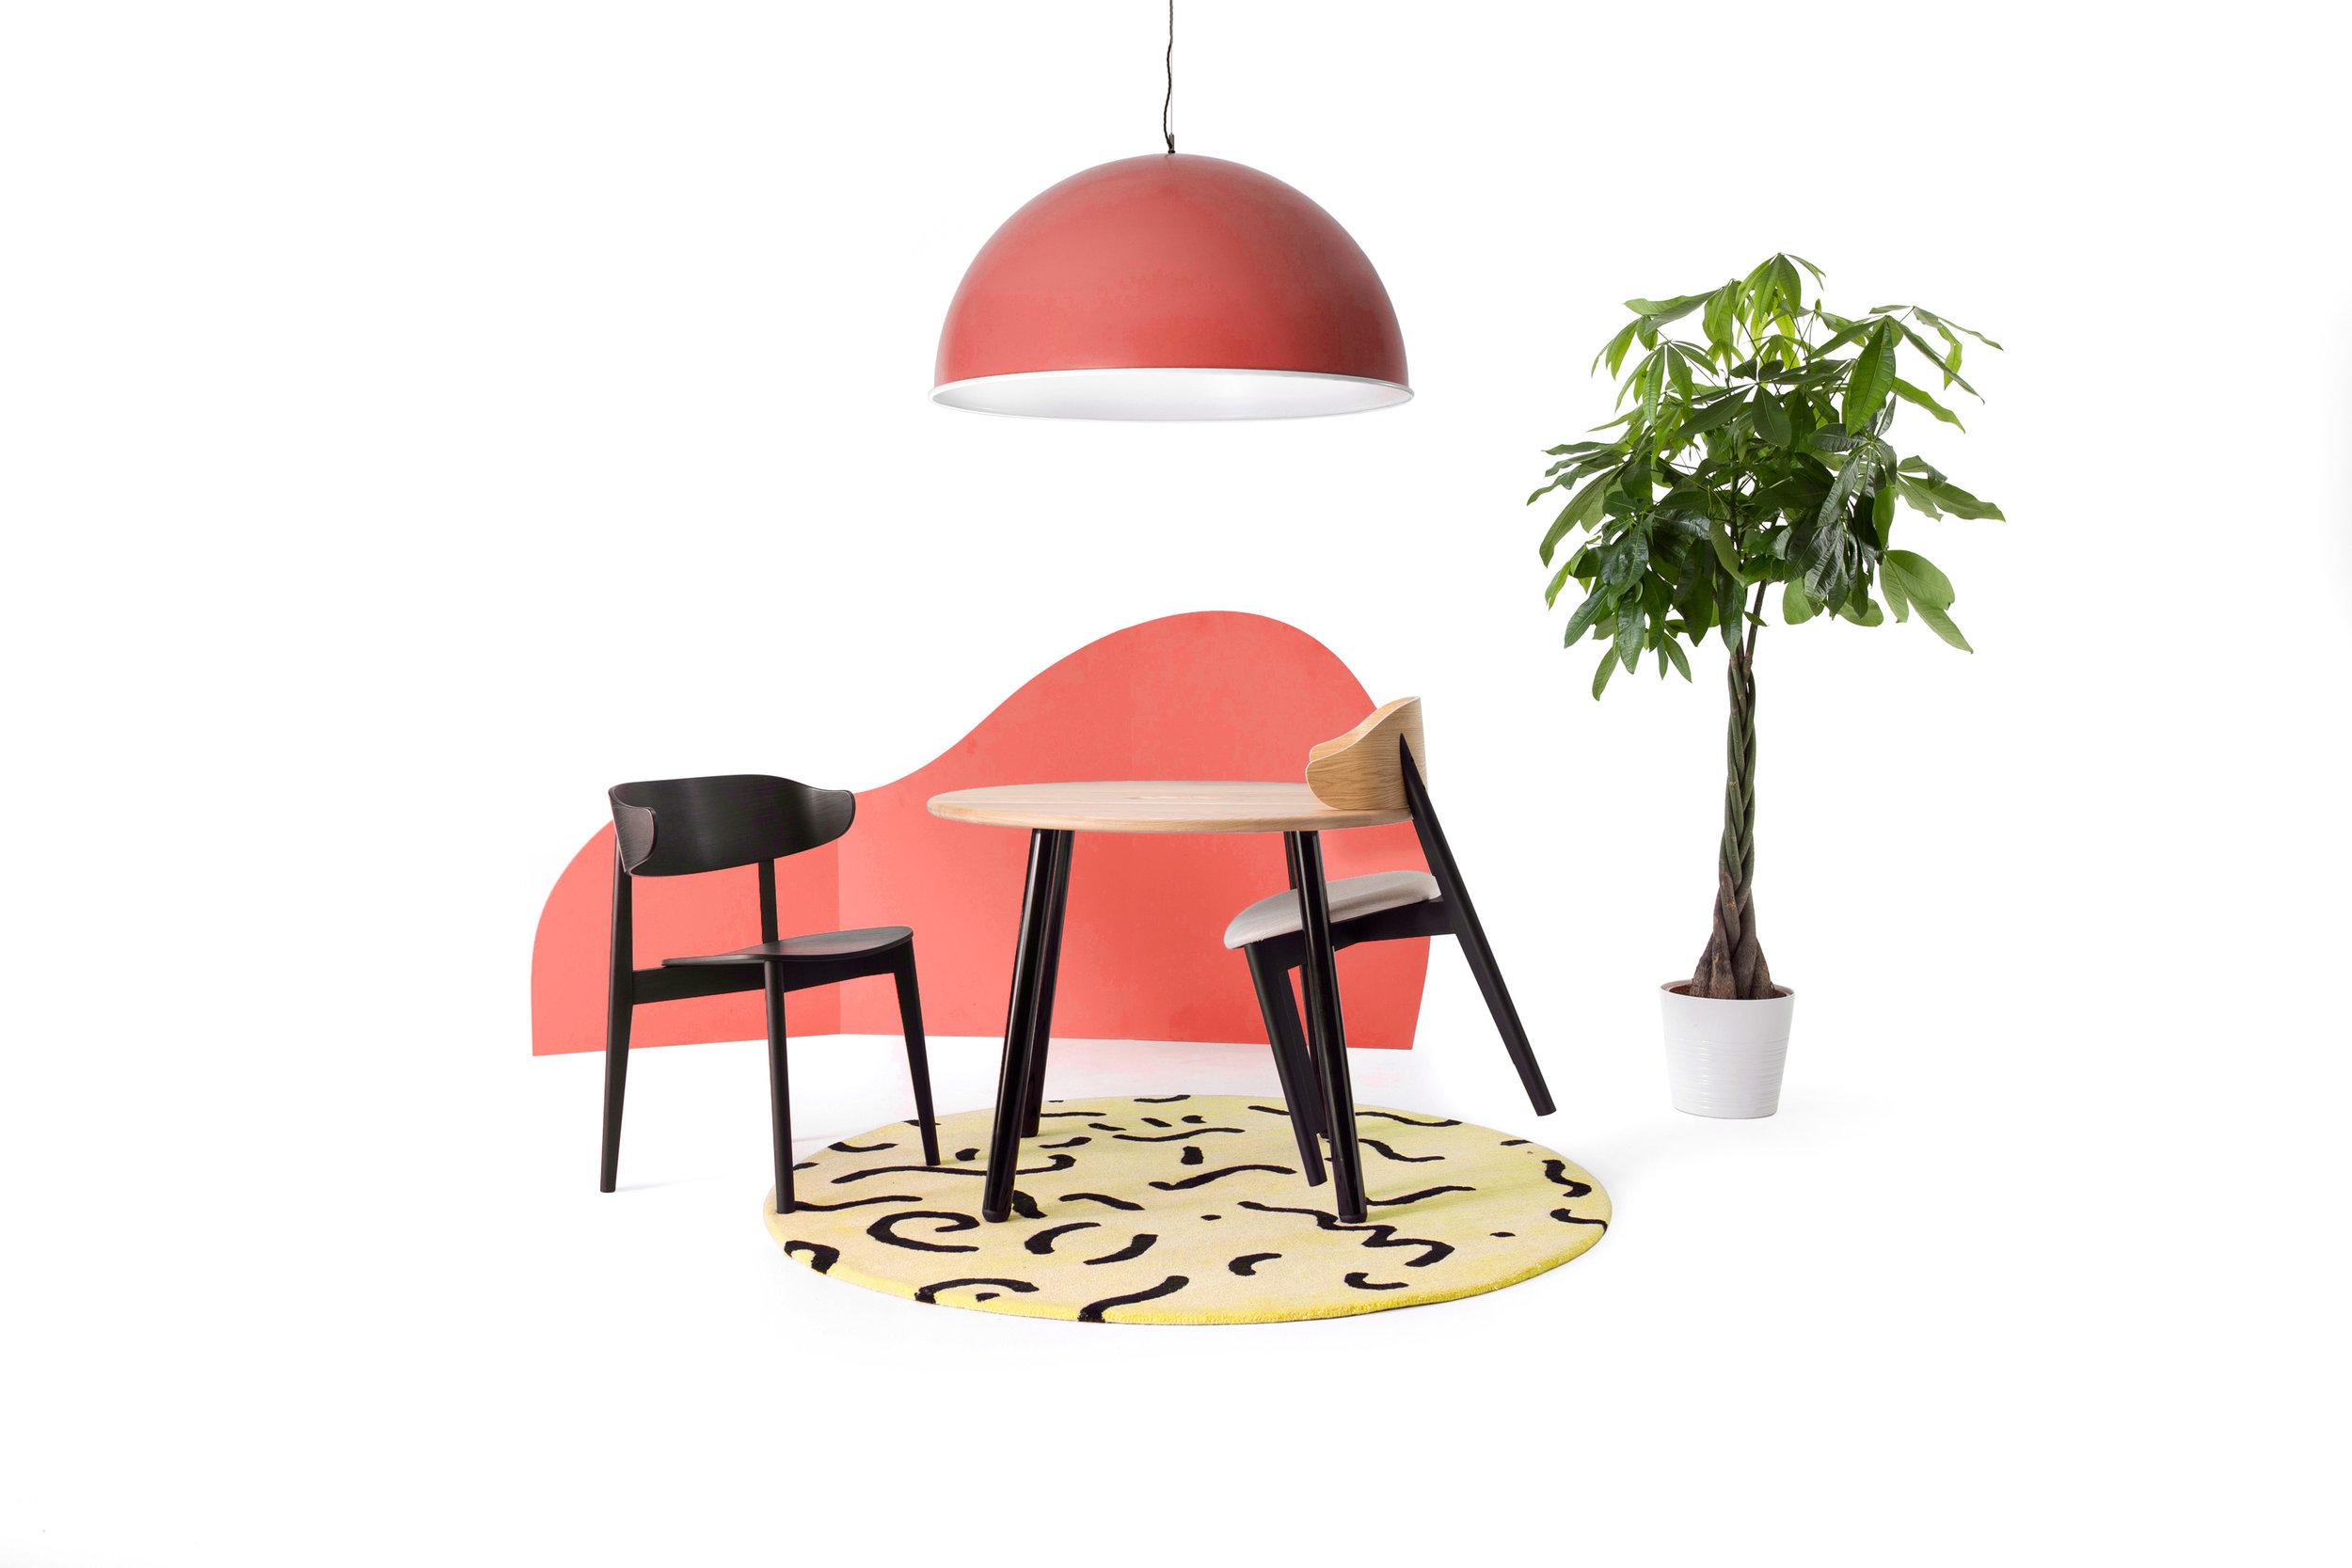 CDW18_Deadgood_Setter_Chair_Spun_Light_WG_Table_Pop_Rug.jpg